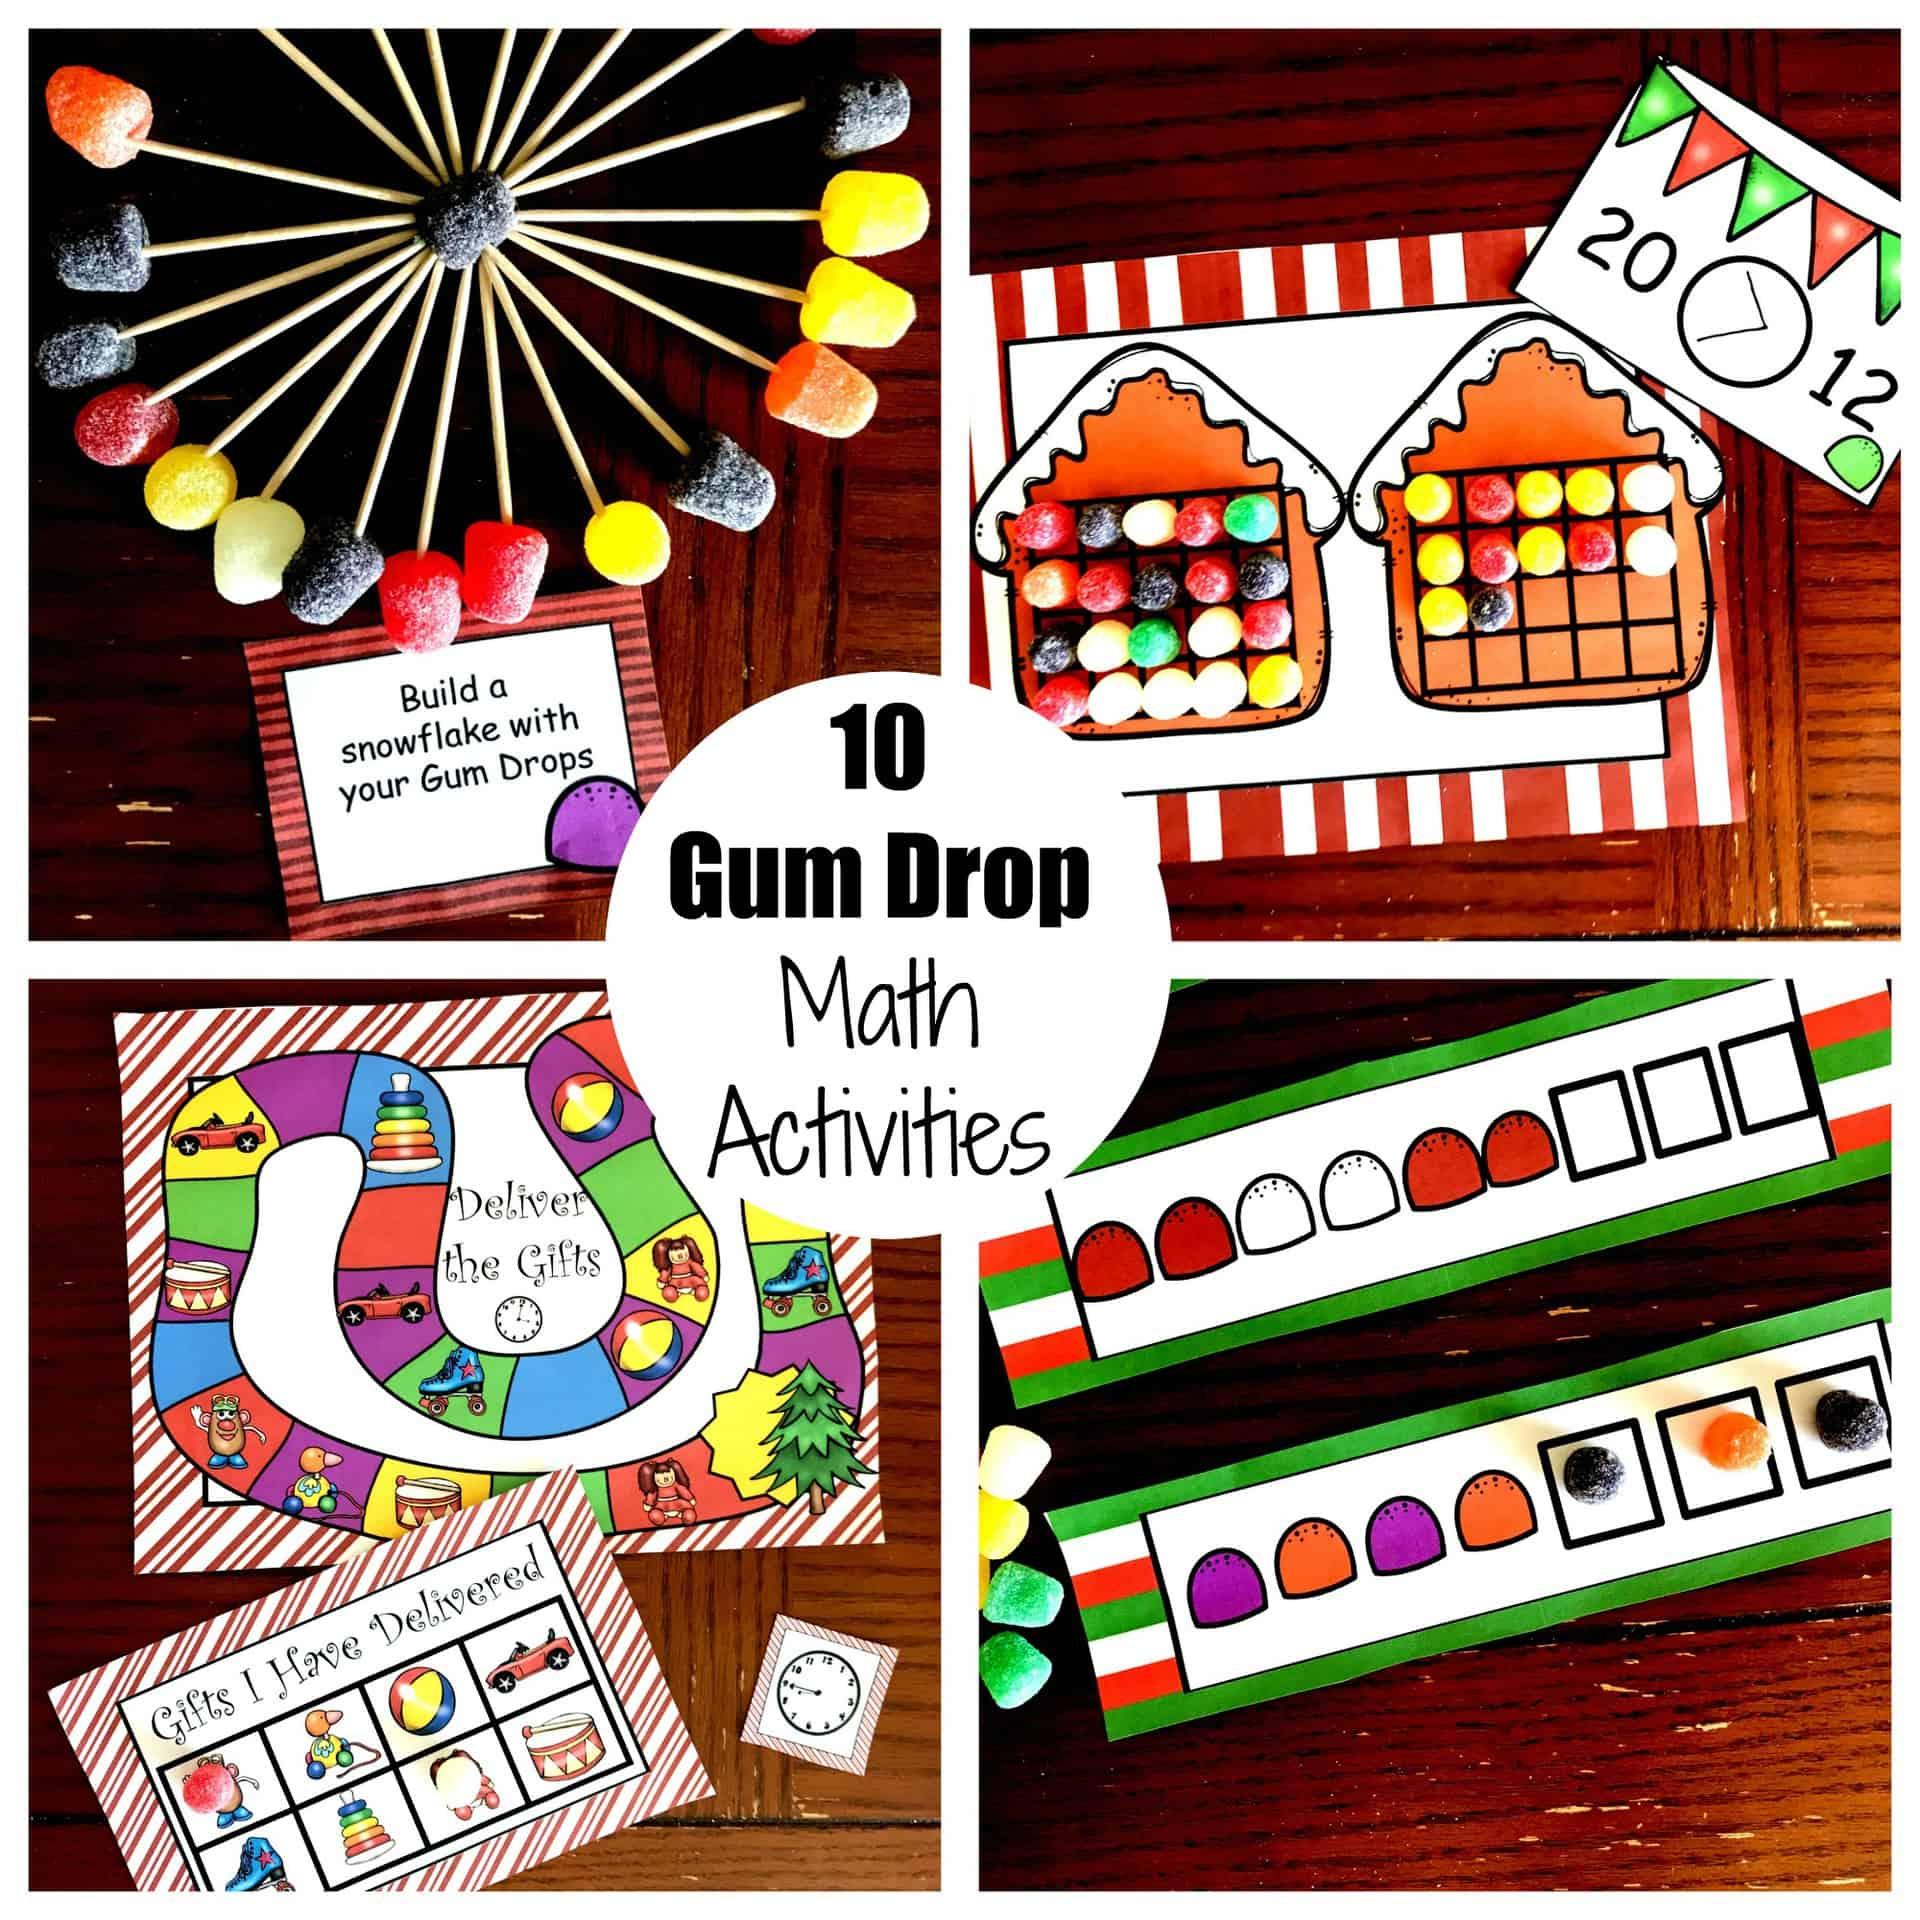 10 Gum Drop Math Activities For Kindergarten Through Fifth Grade